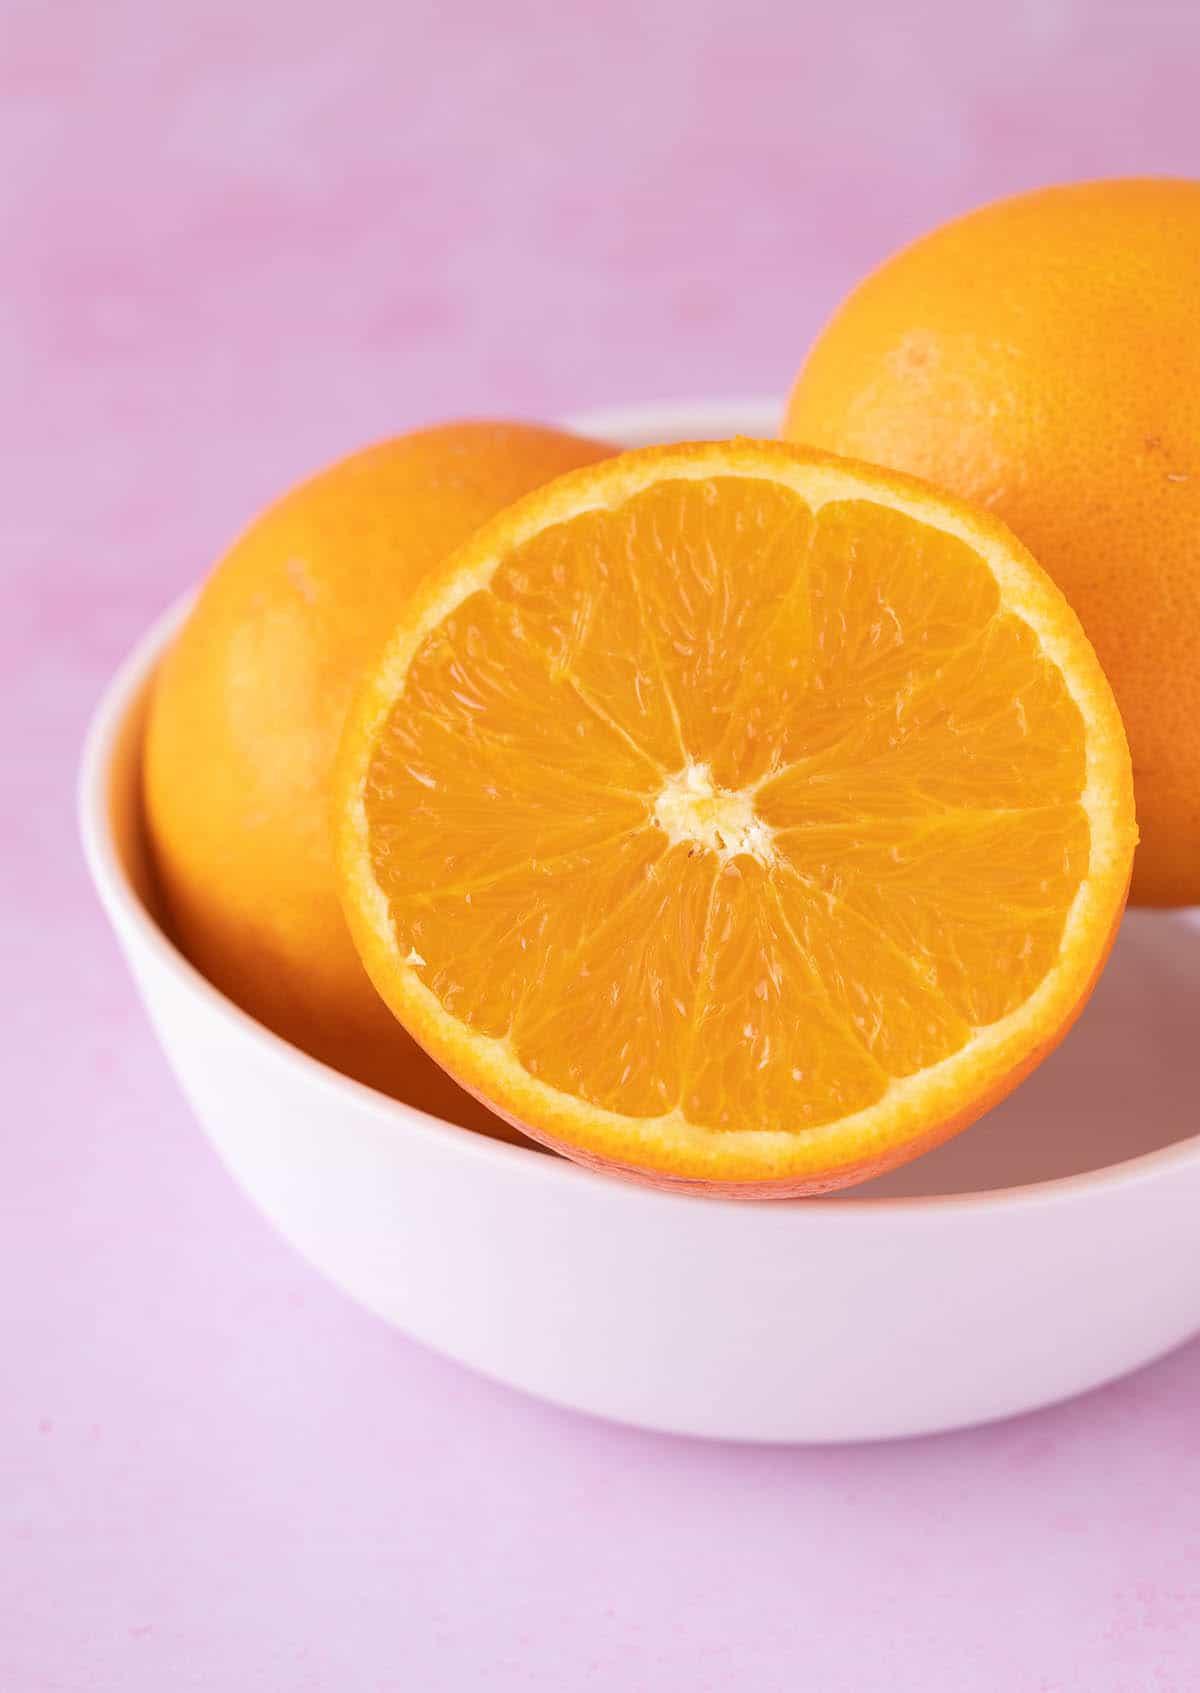 A bowl of fresh oranges